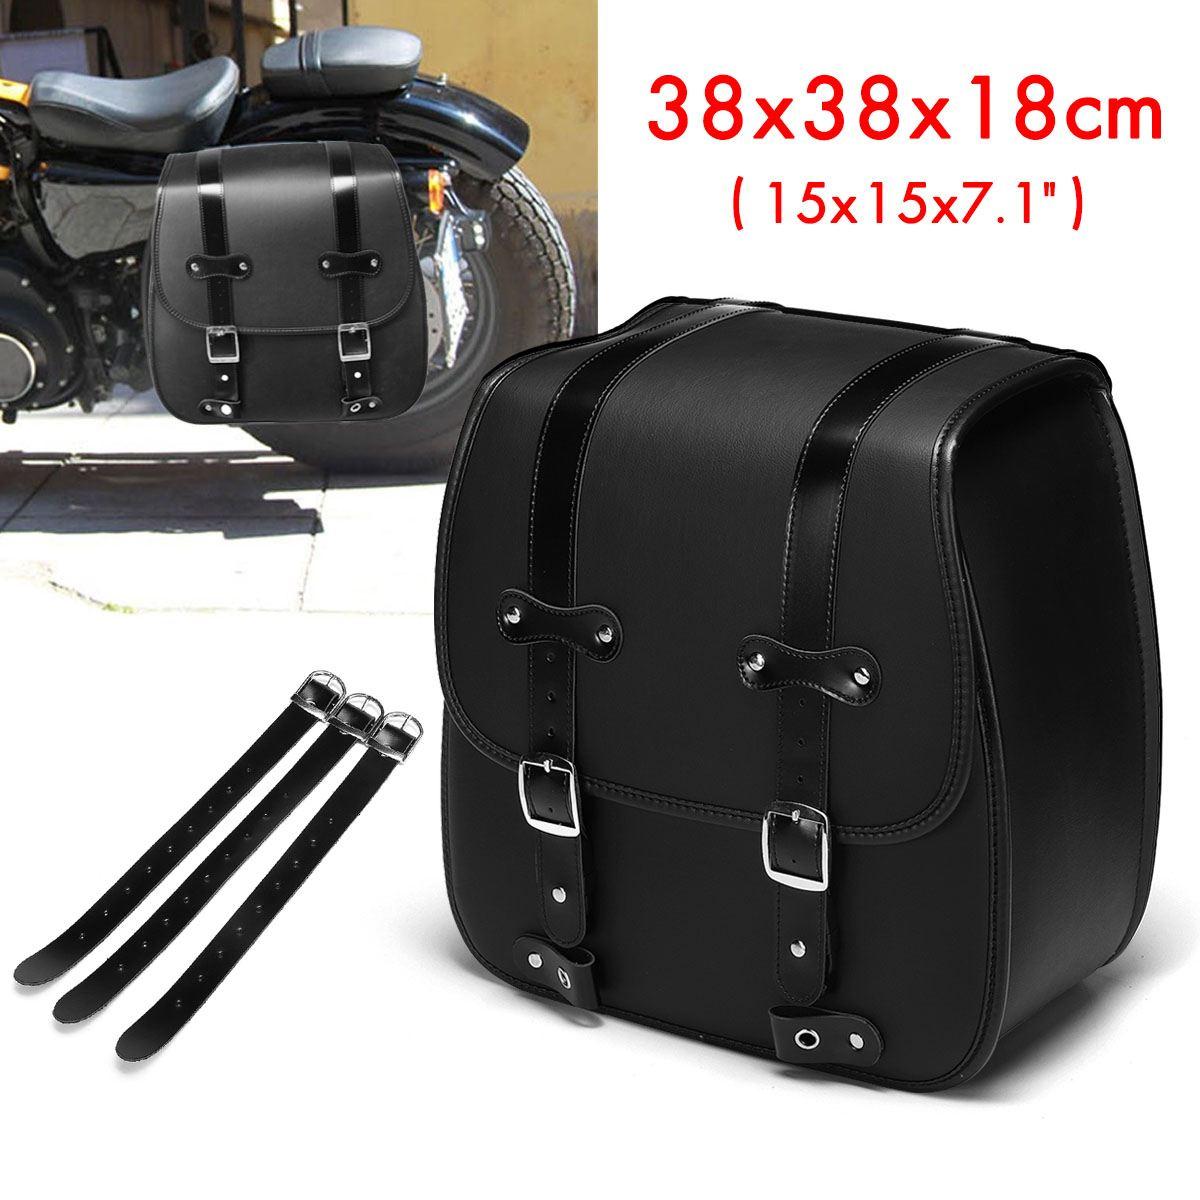 Alforja de la motocicleta 35x35x18 cm, cuero de la PU, herramienta lateral izquierda, equipaje, silla de montar, bolsa negra para Honda/Yamaha/Suzuki